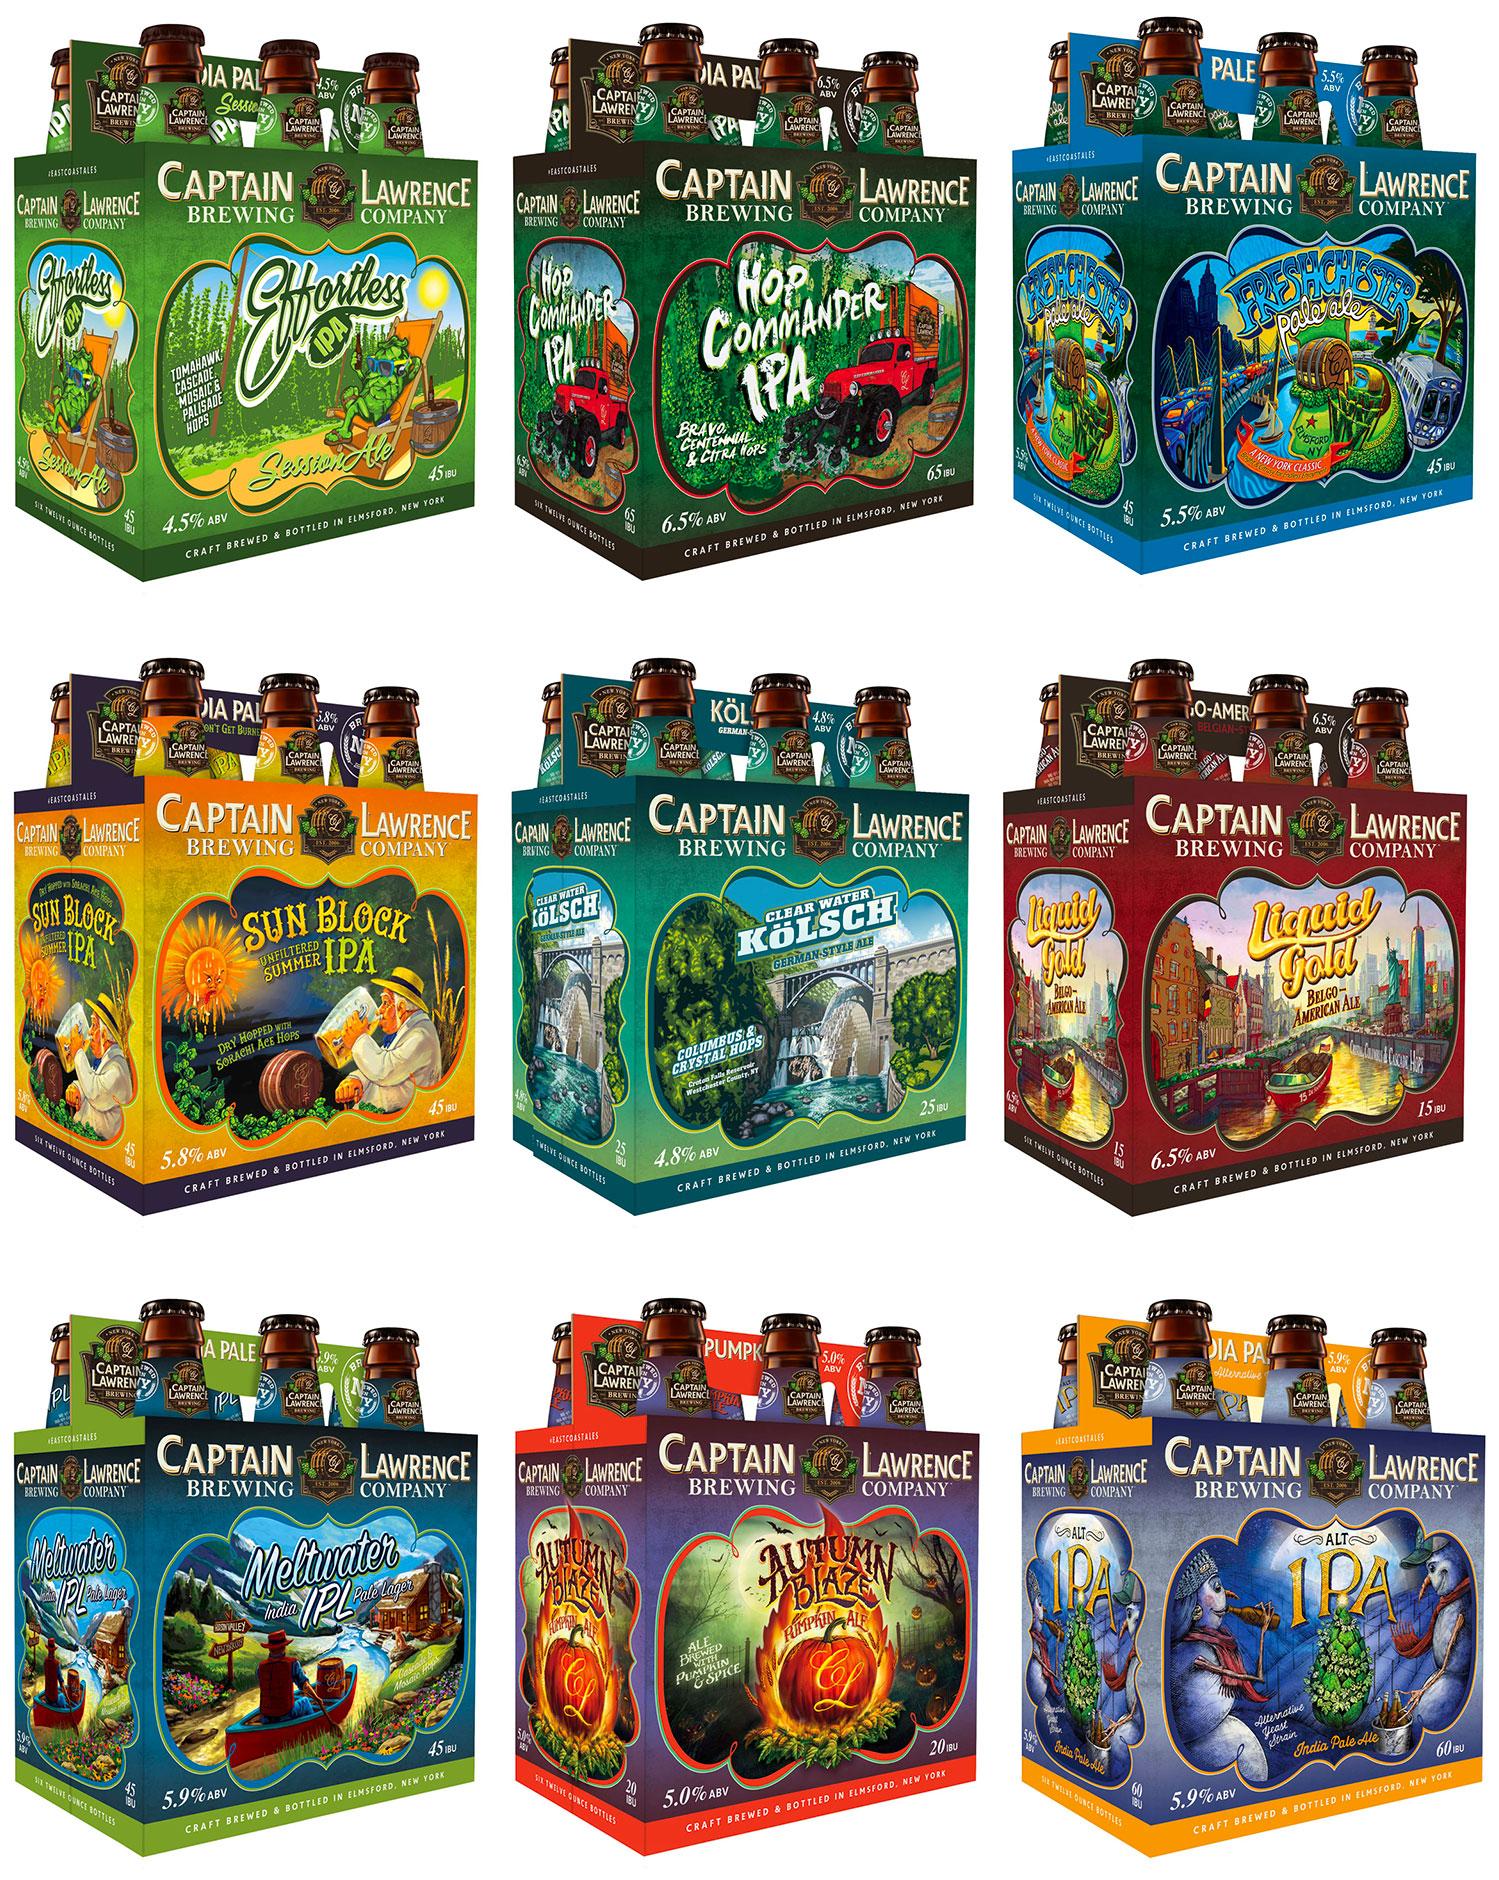 Captain Lawrence Beer Brands